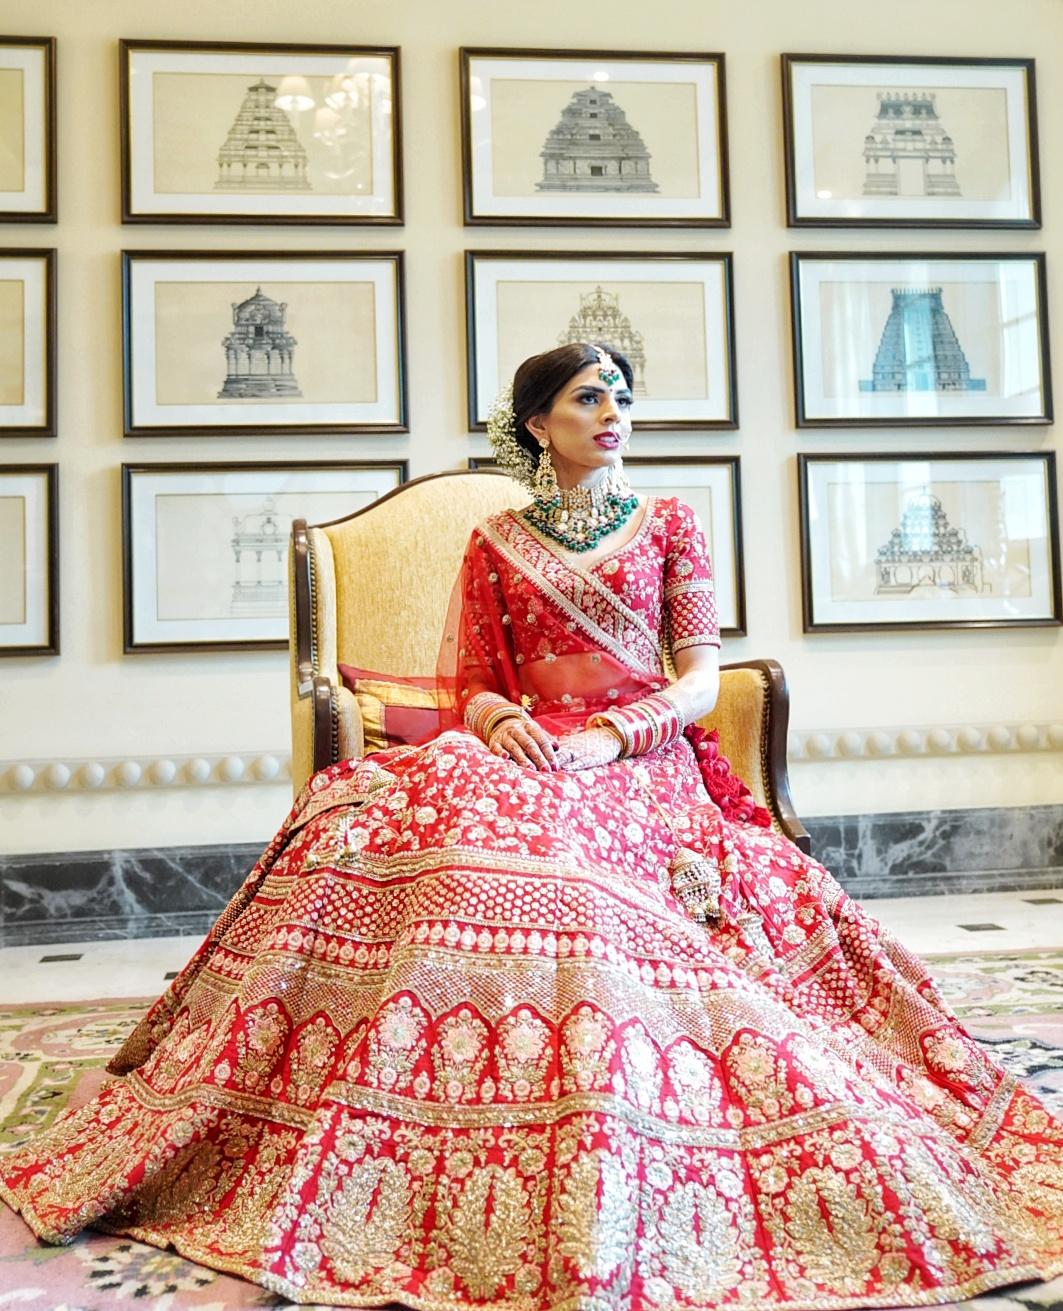 Mpire Weddings Plans & Executes A Beautiful Wedding at the ITC Grand Bharat, Gurgaon